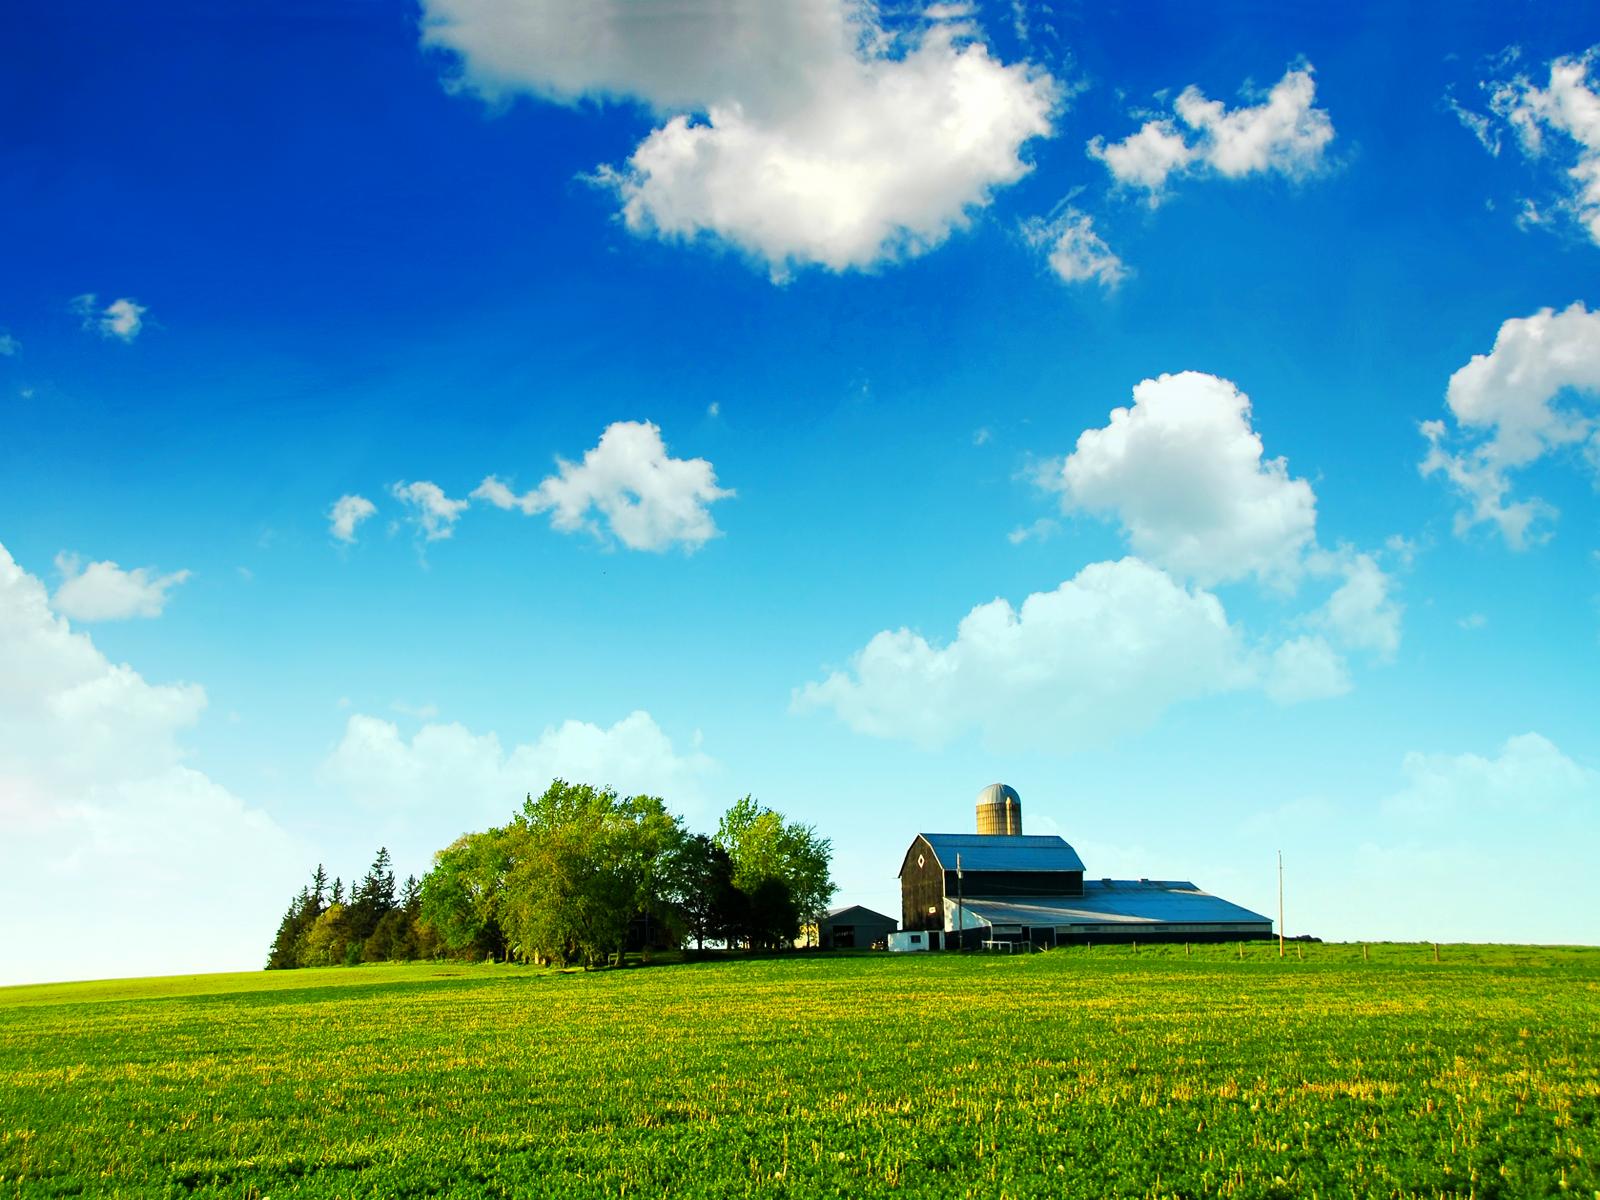 Farmland Blue Skies Bliss wallpaper Reforming Wall St and Republican 1600x1200